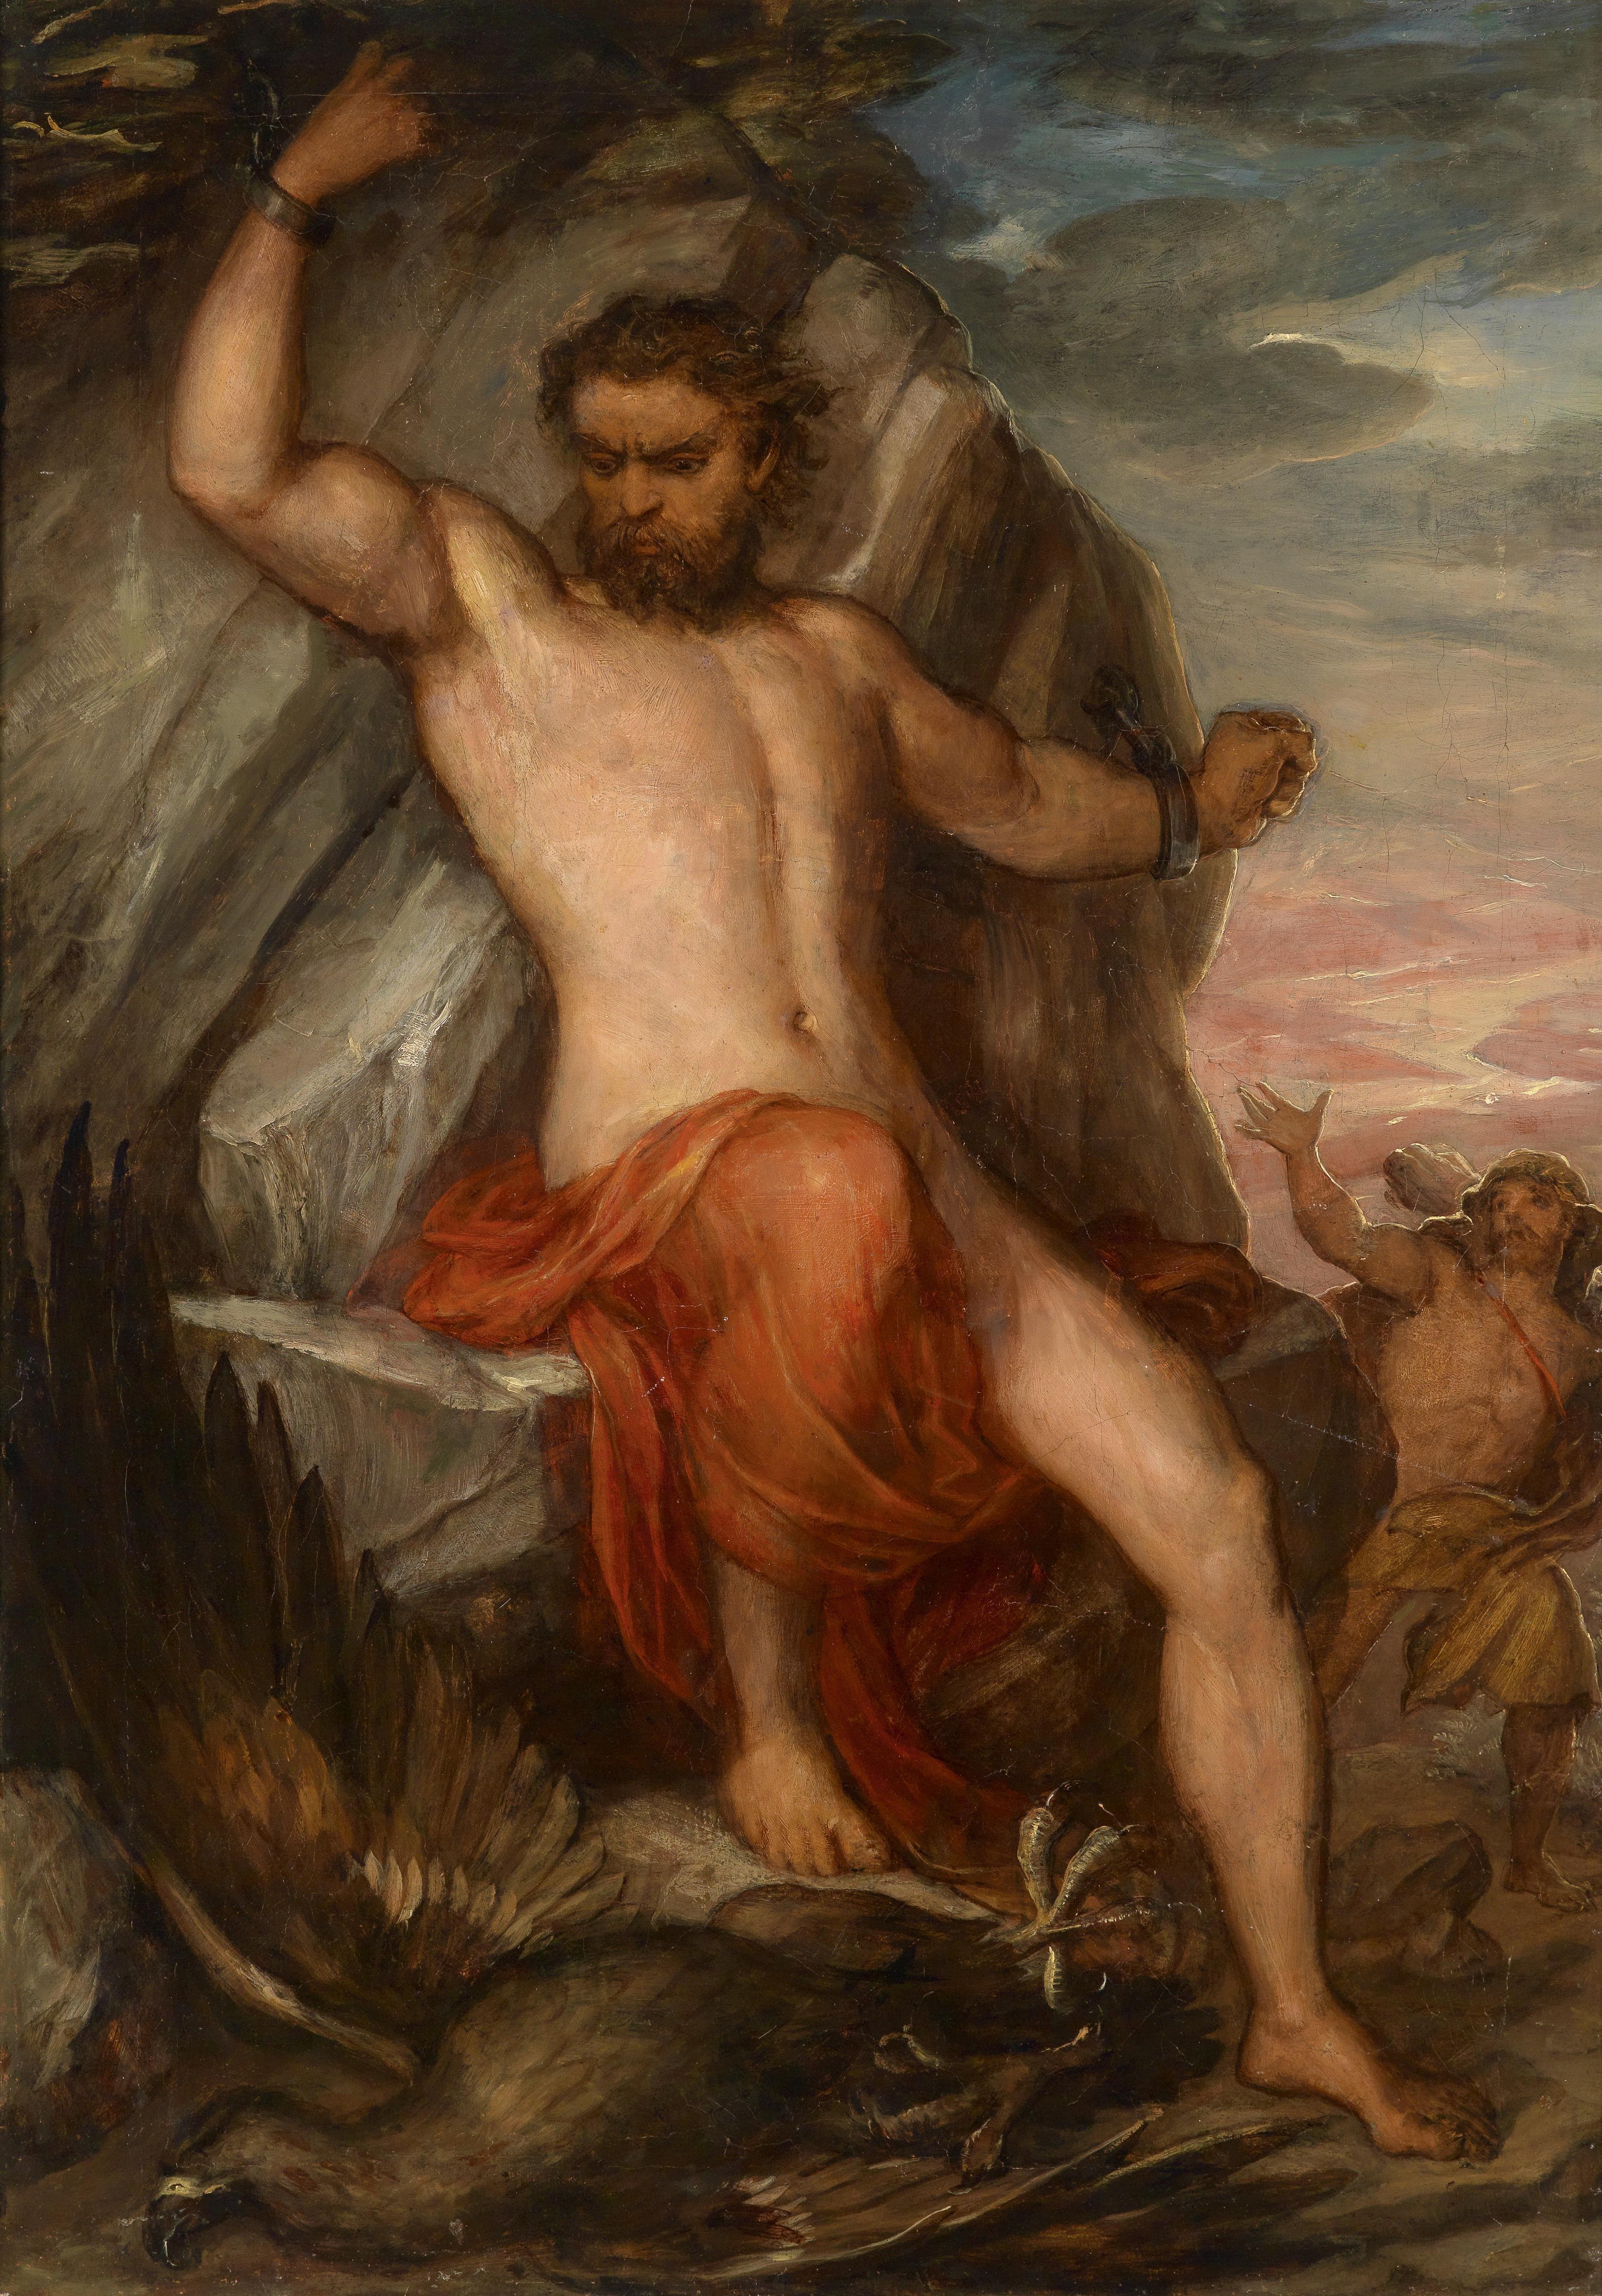 epimetheus and pandora relationship